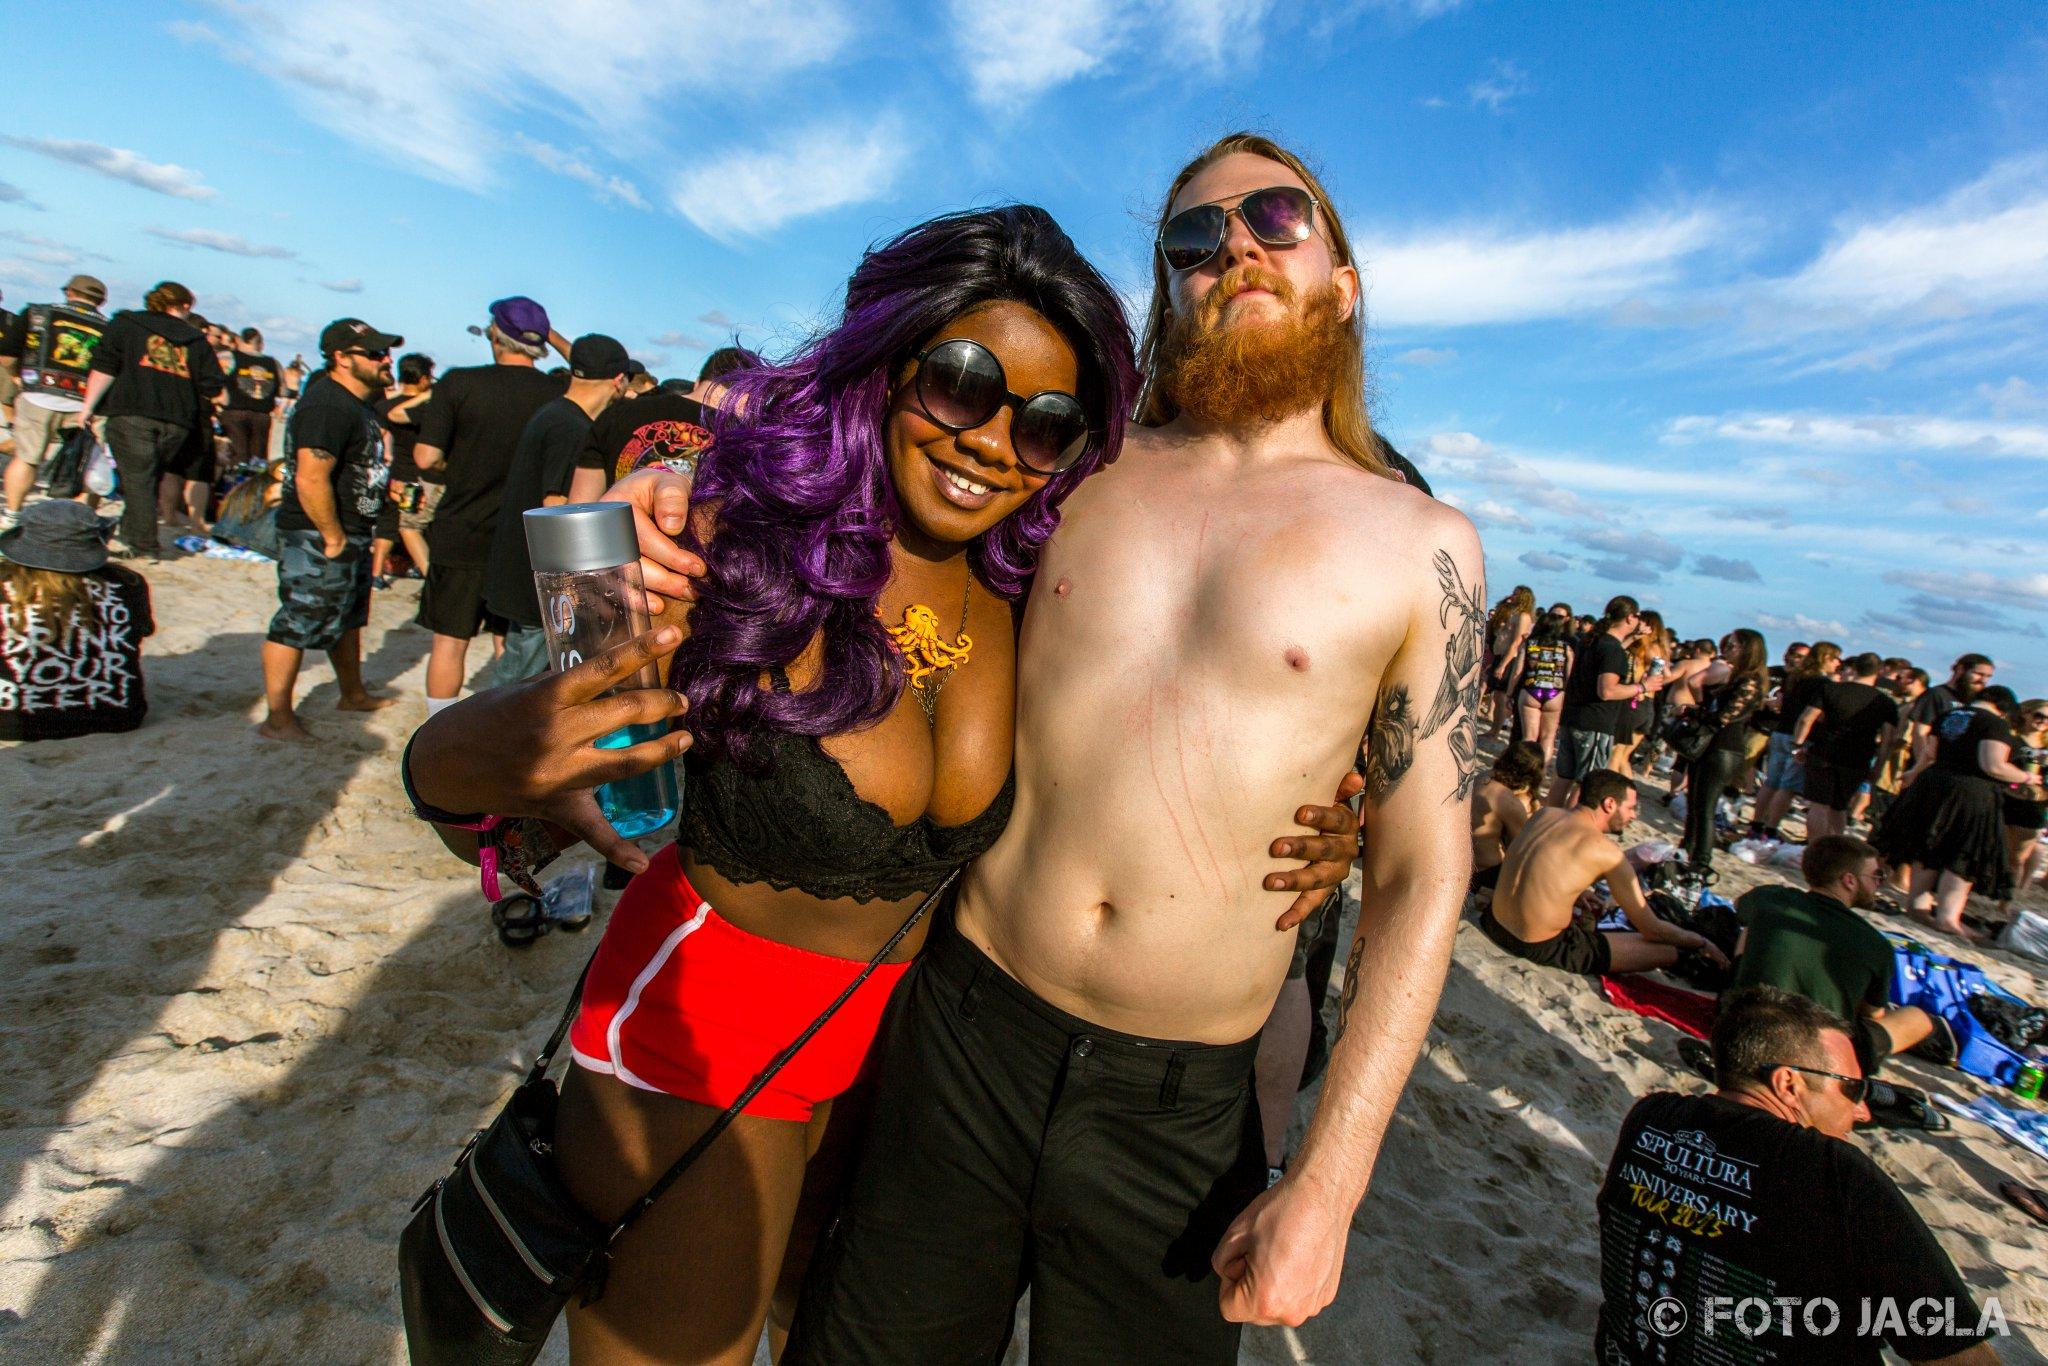 70000 Tons Of Metal 2017 Beachparty at South Beach, Miami (Florida)